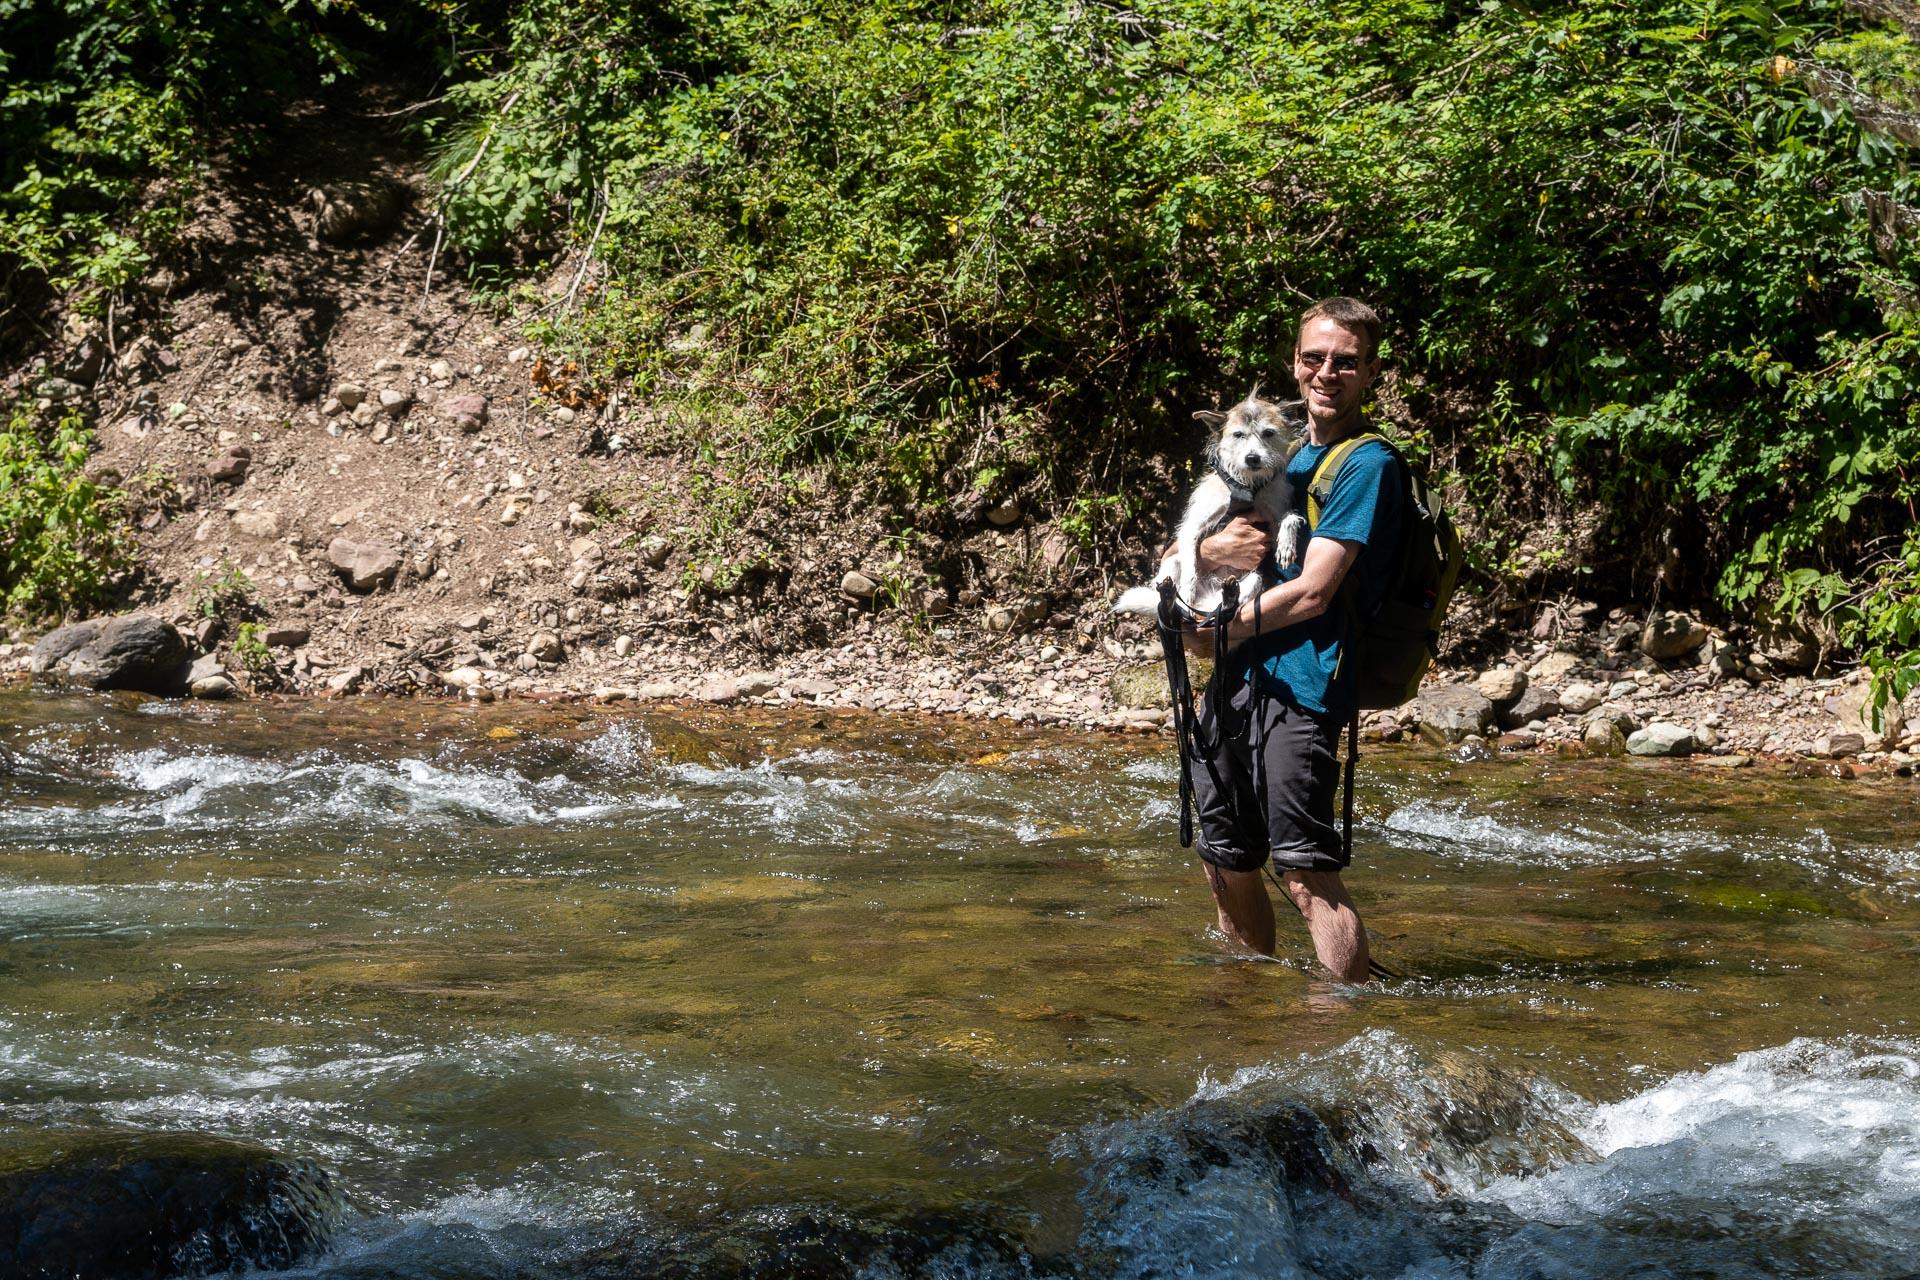 Crossing Stanton Creek